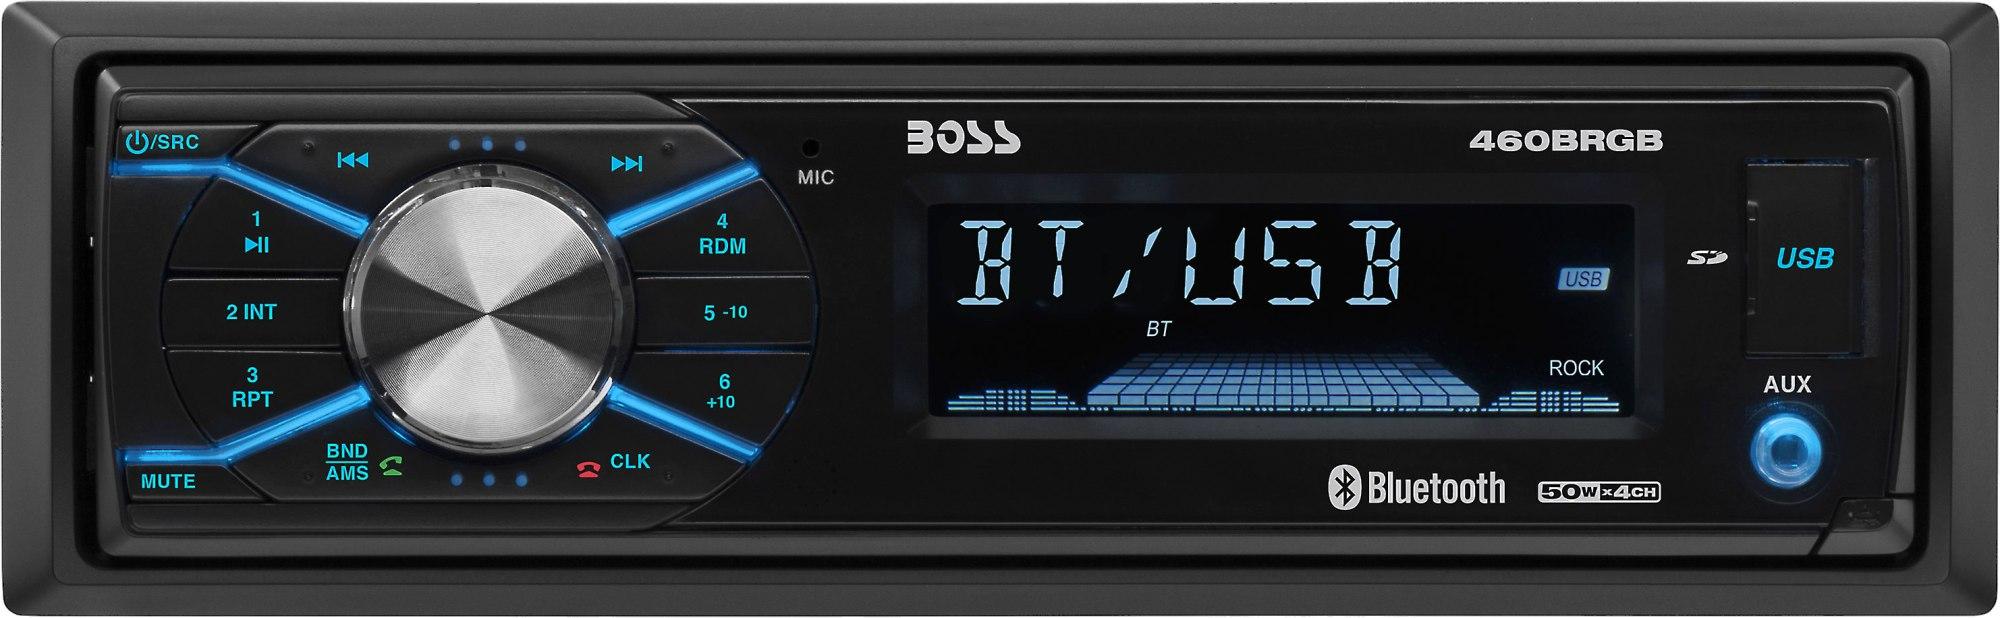 hight resolution of boss 460brgb does not play cds digital media receiver at crutchfield com